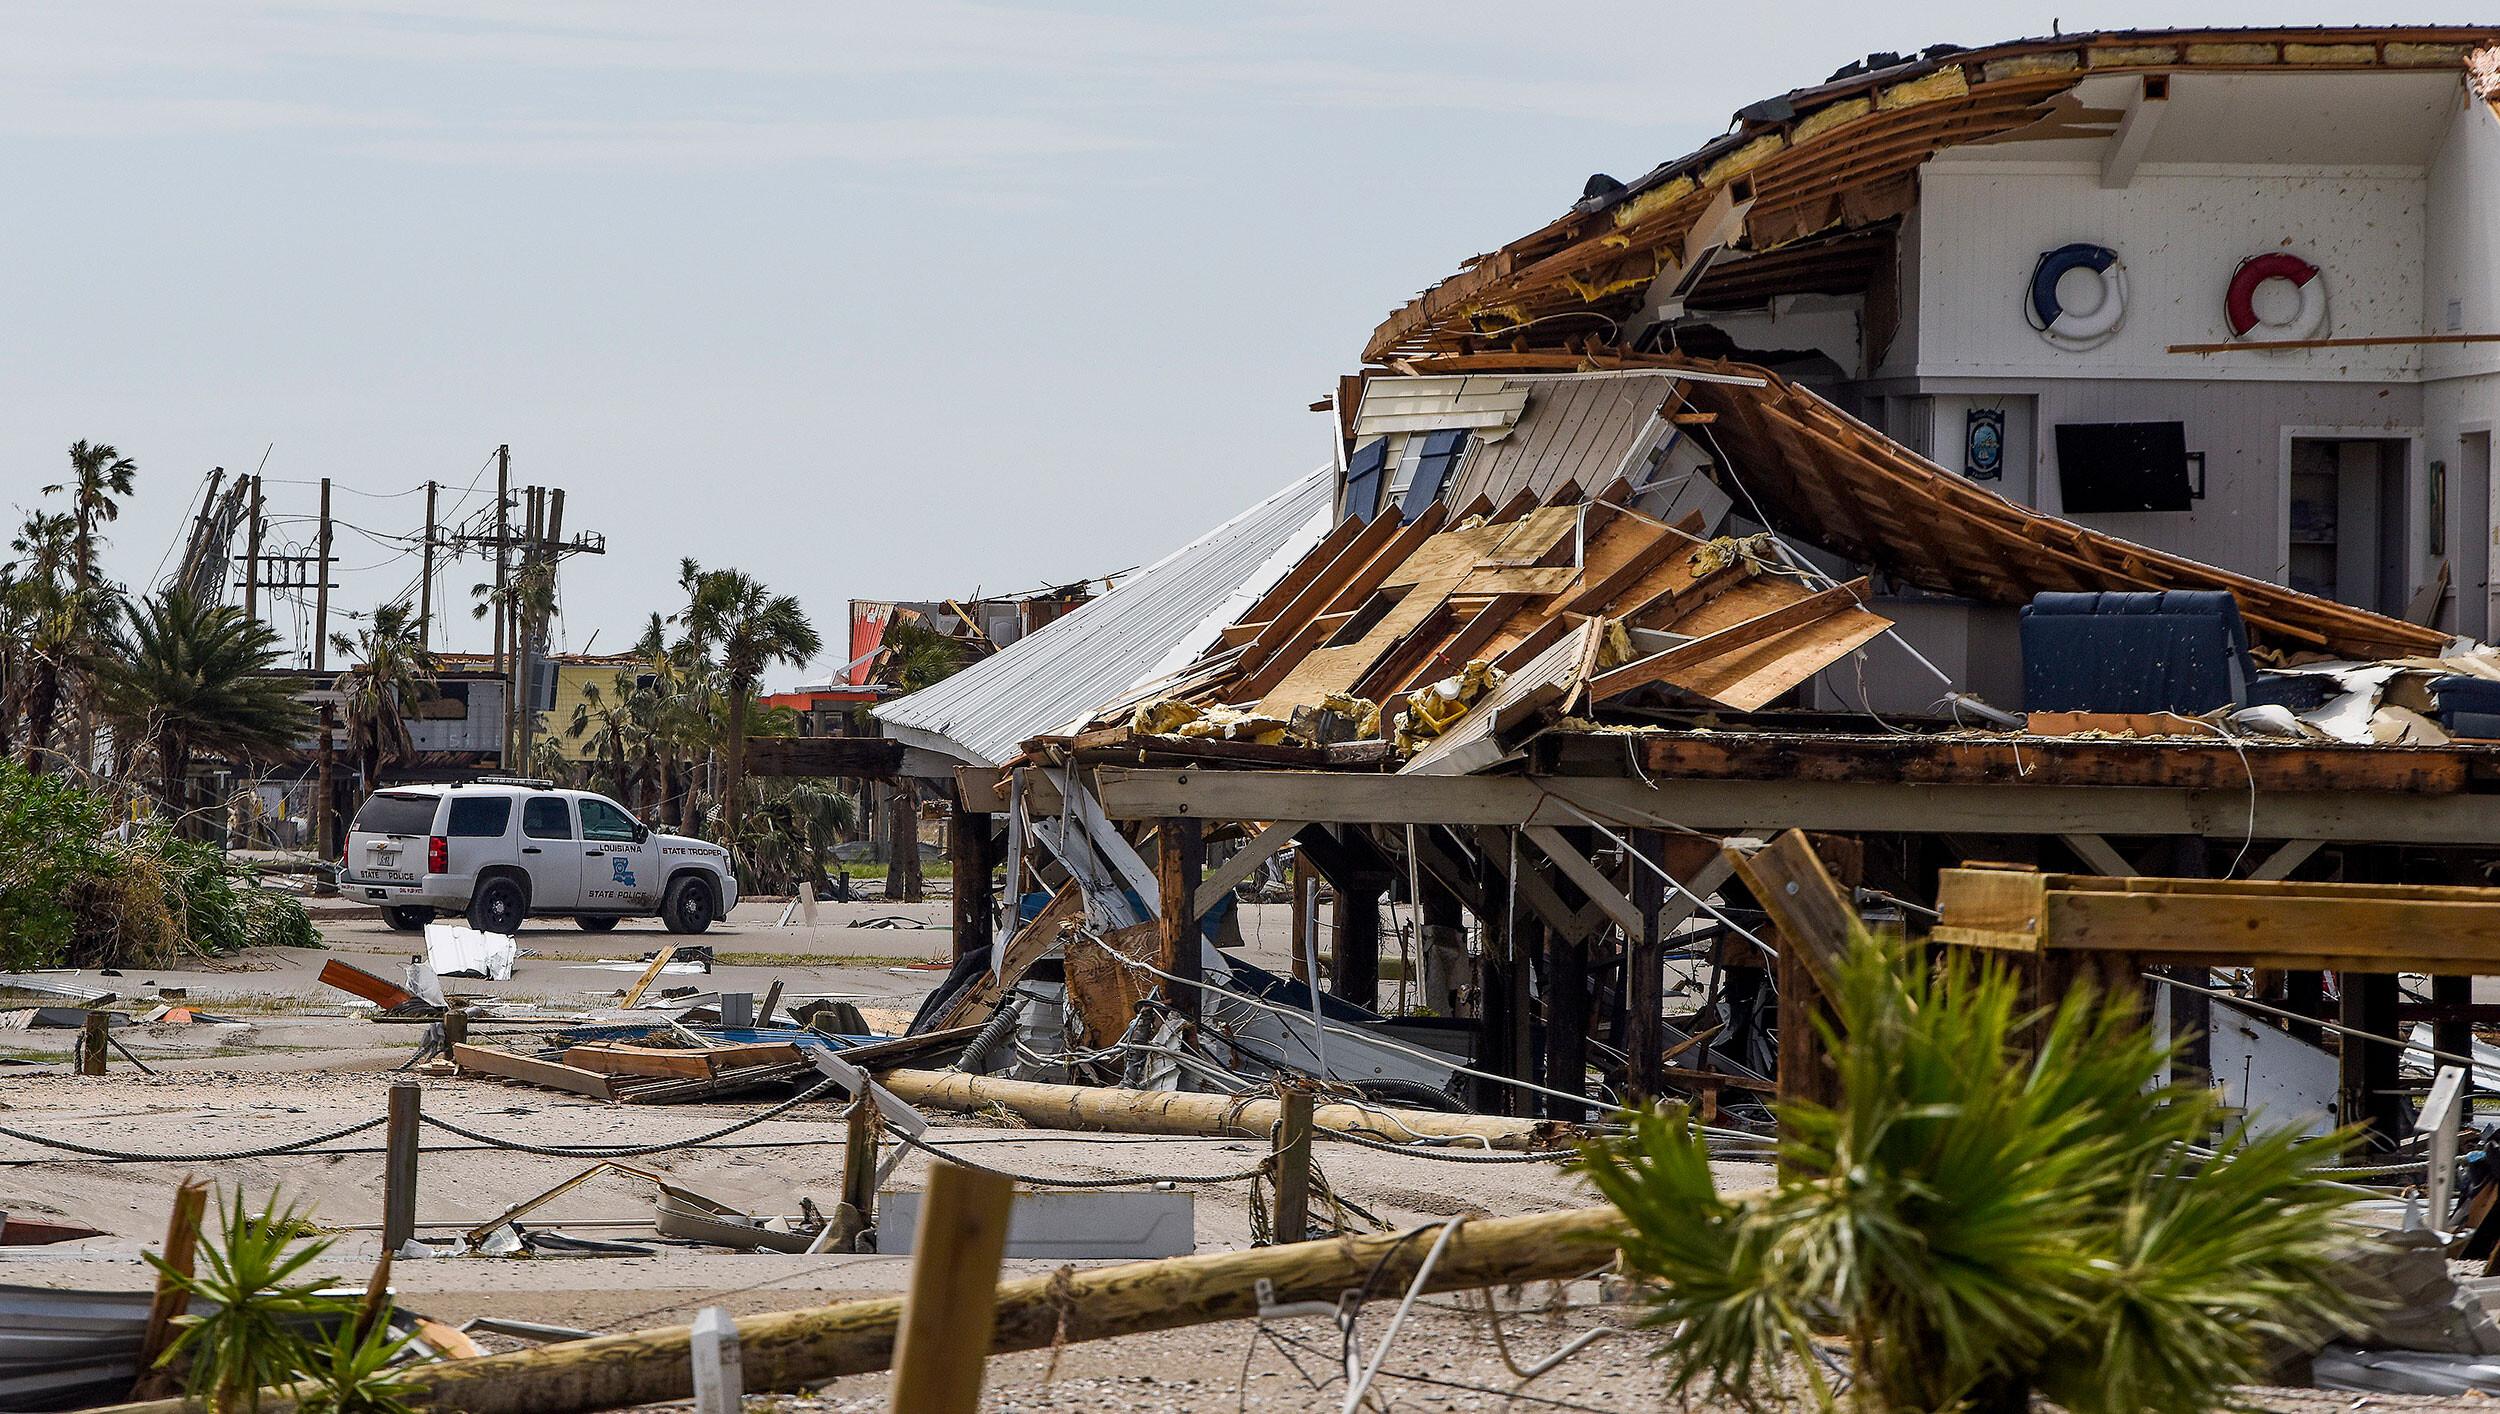 Louisiana's last inhabited barrier island bore the brunt of Hurricane Ida. Here's what it looks like now